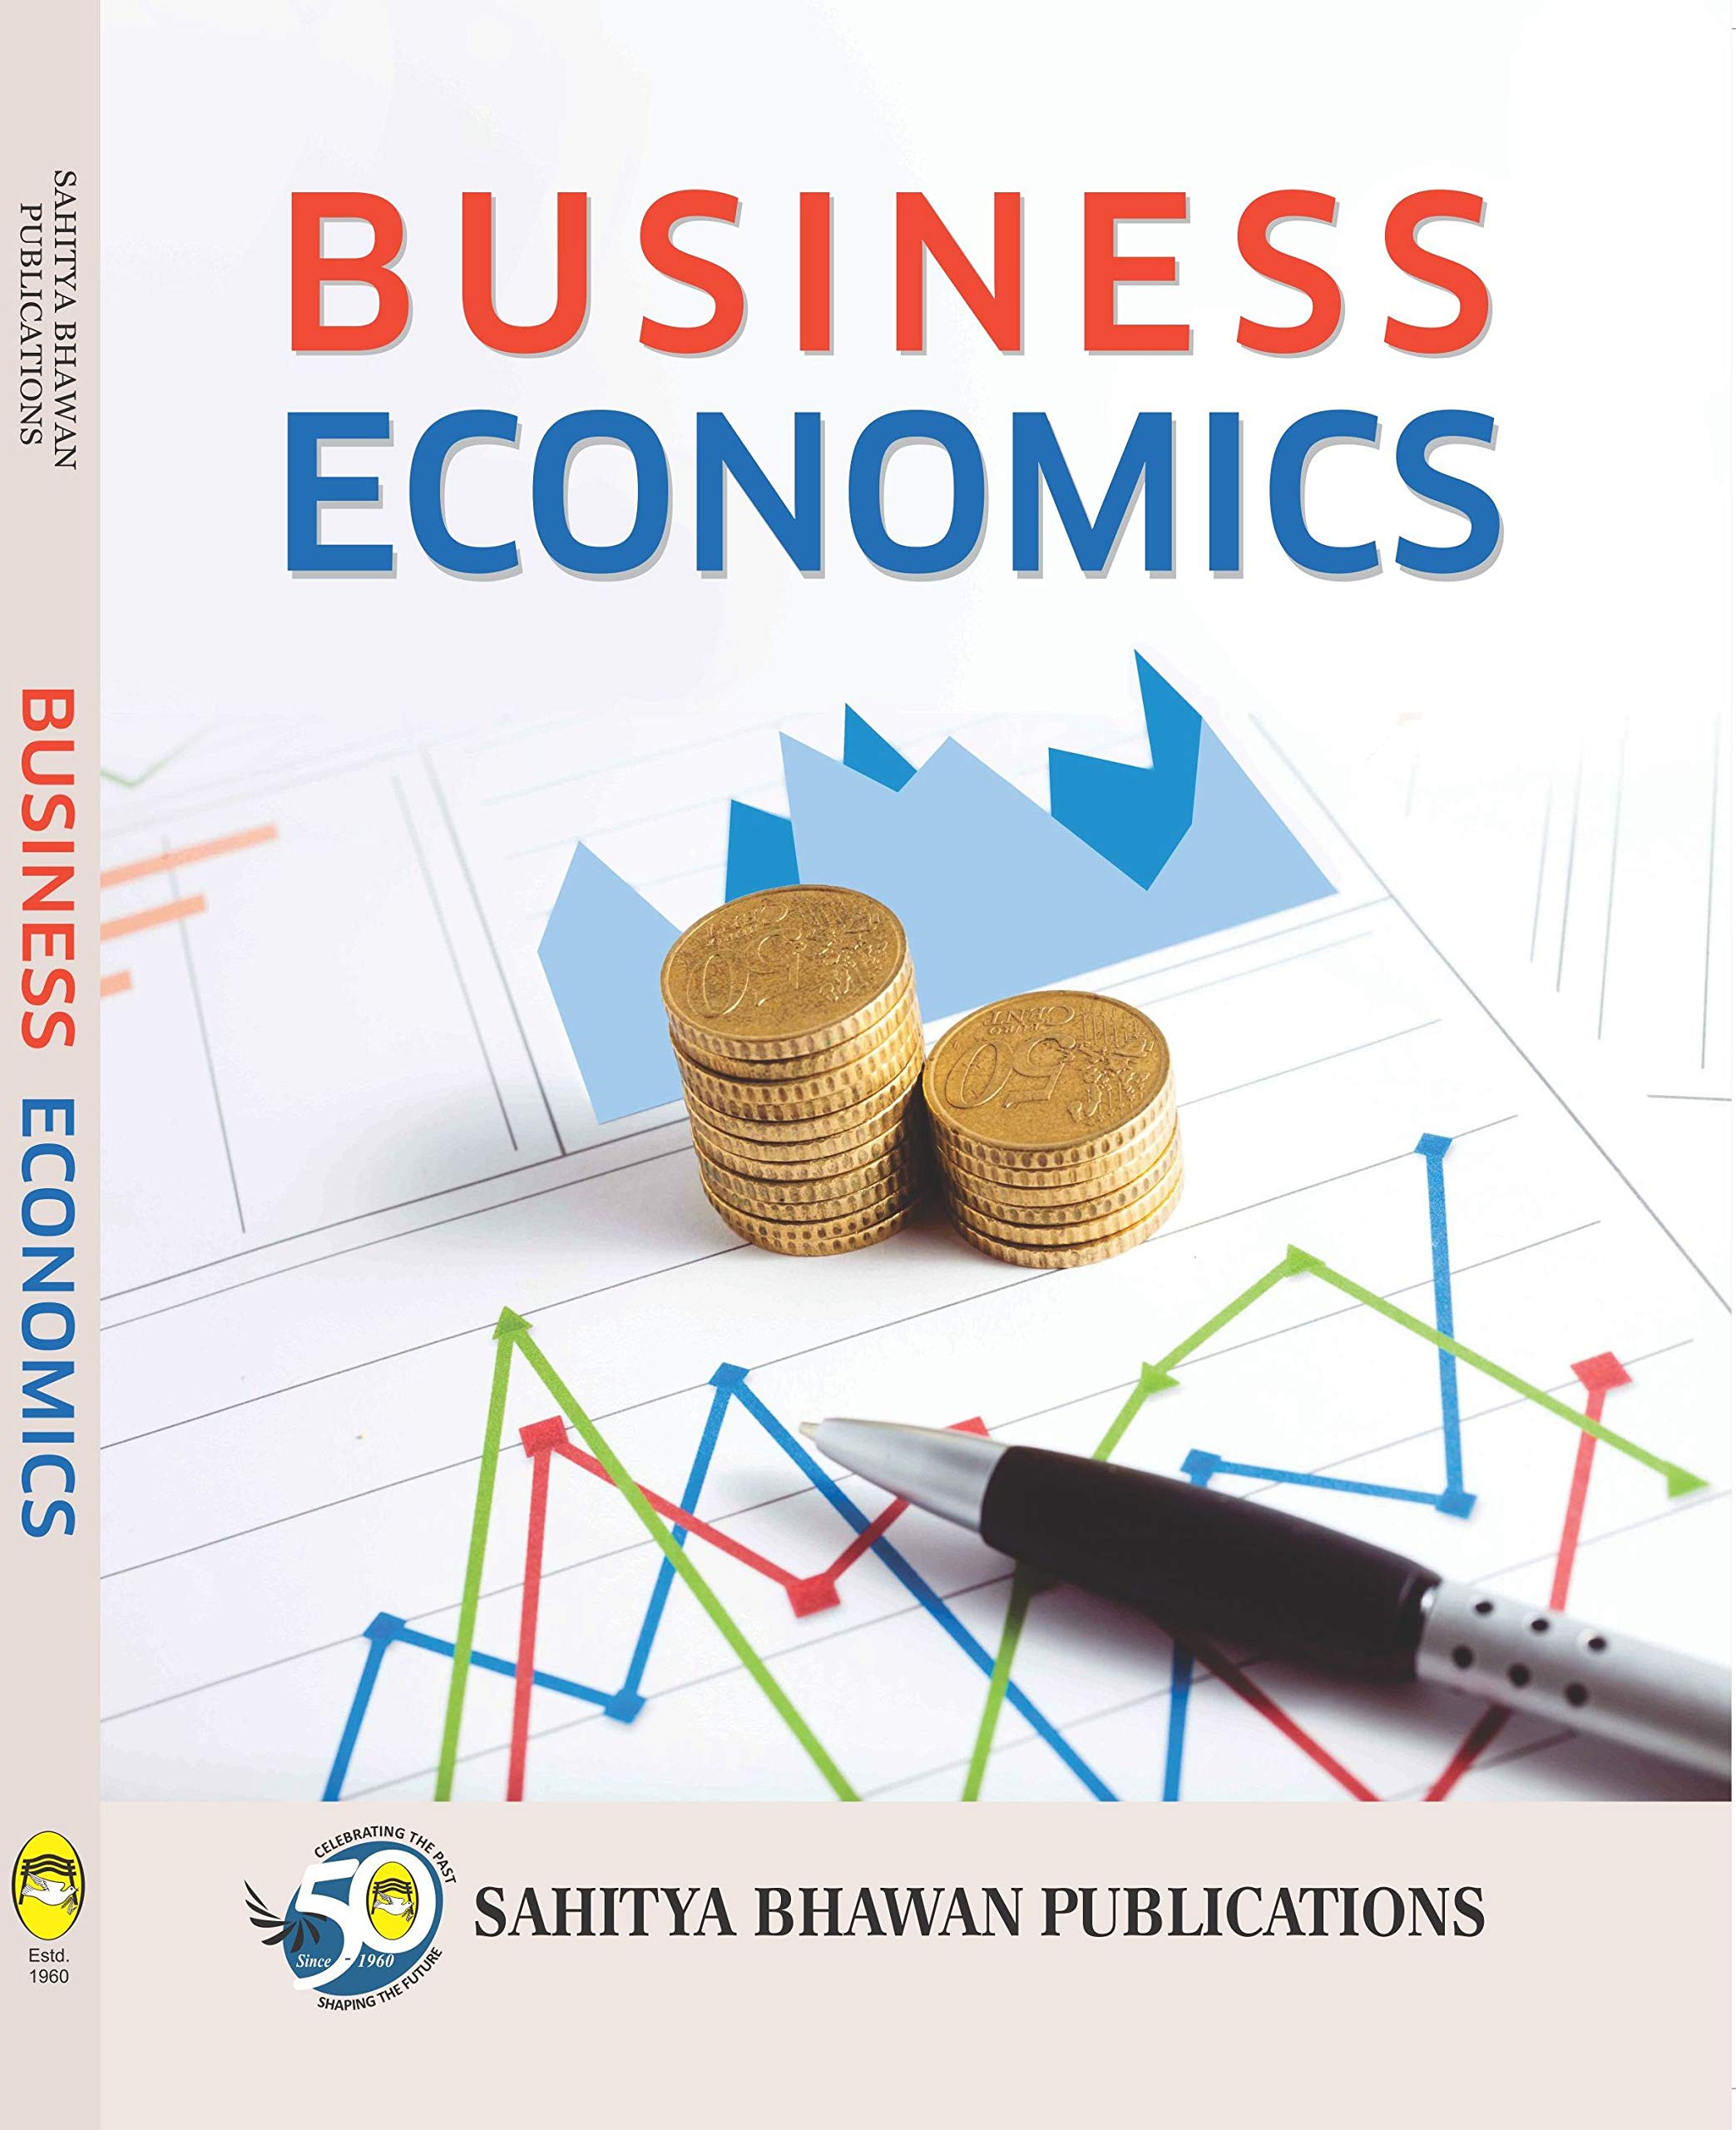 Business Economics For B.Com Ist Year Dr. Bhim Rao Ambedkar University,  Agra Book Code:2776: Amazon.in: Dr. J.P. Mishra, Dr. S.K. Singh: Books